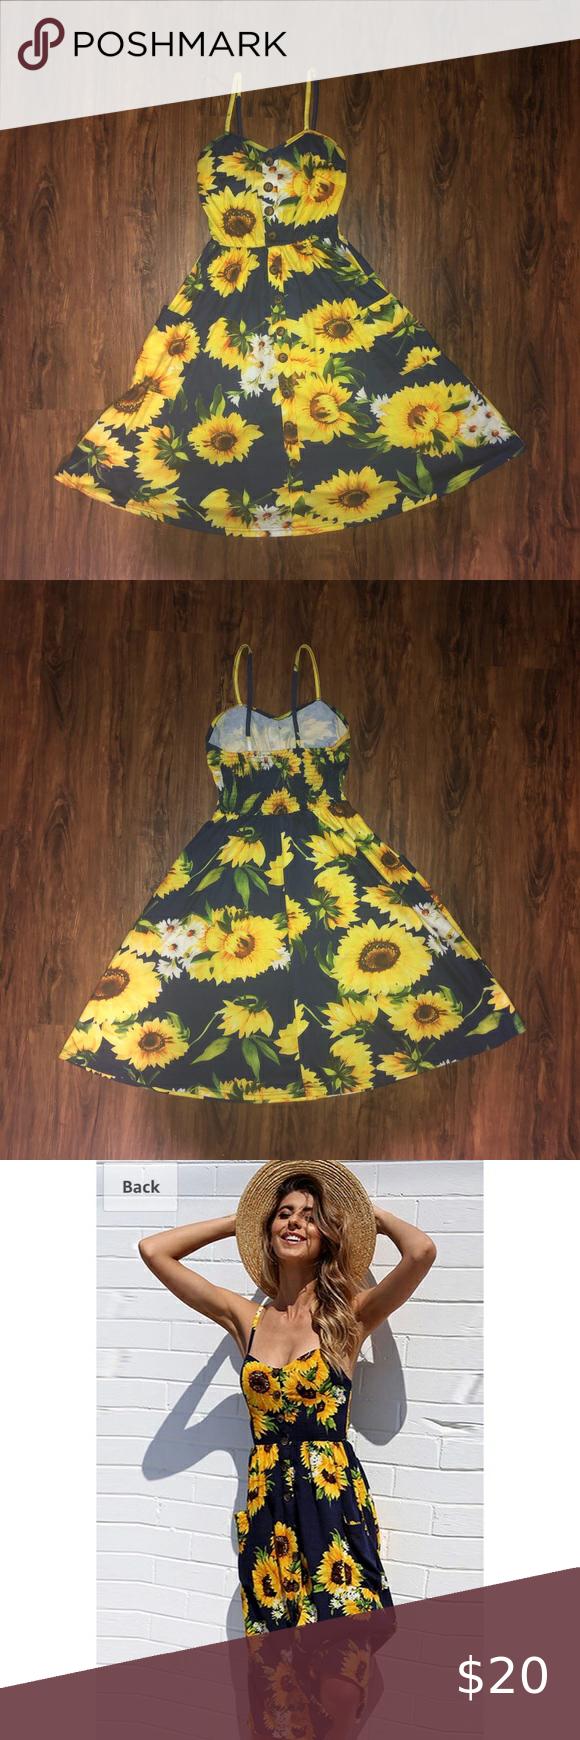 Women S Spaghetti Strap Sunflower Midi Dress Women S Summer Floral Bohemian Dress Non Adjustable Spaghetti S Bohemian Floral Dress Midi Dress Midi Swing Dress [ 1740 x 580 Pixel ]